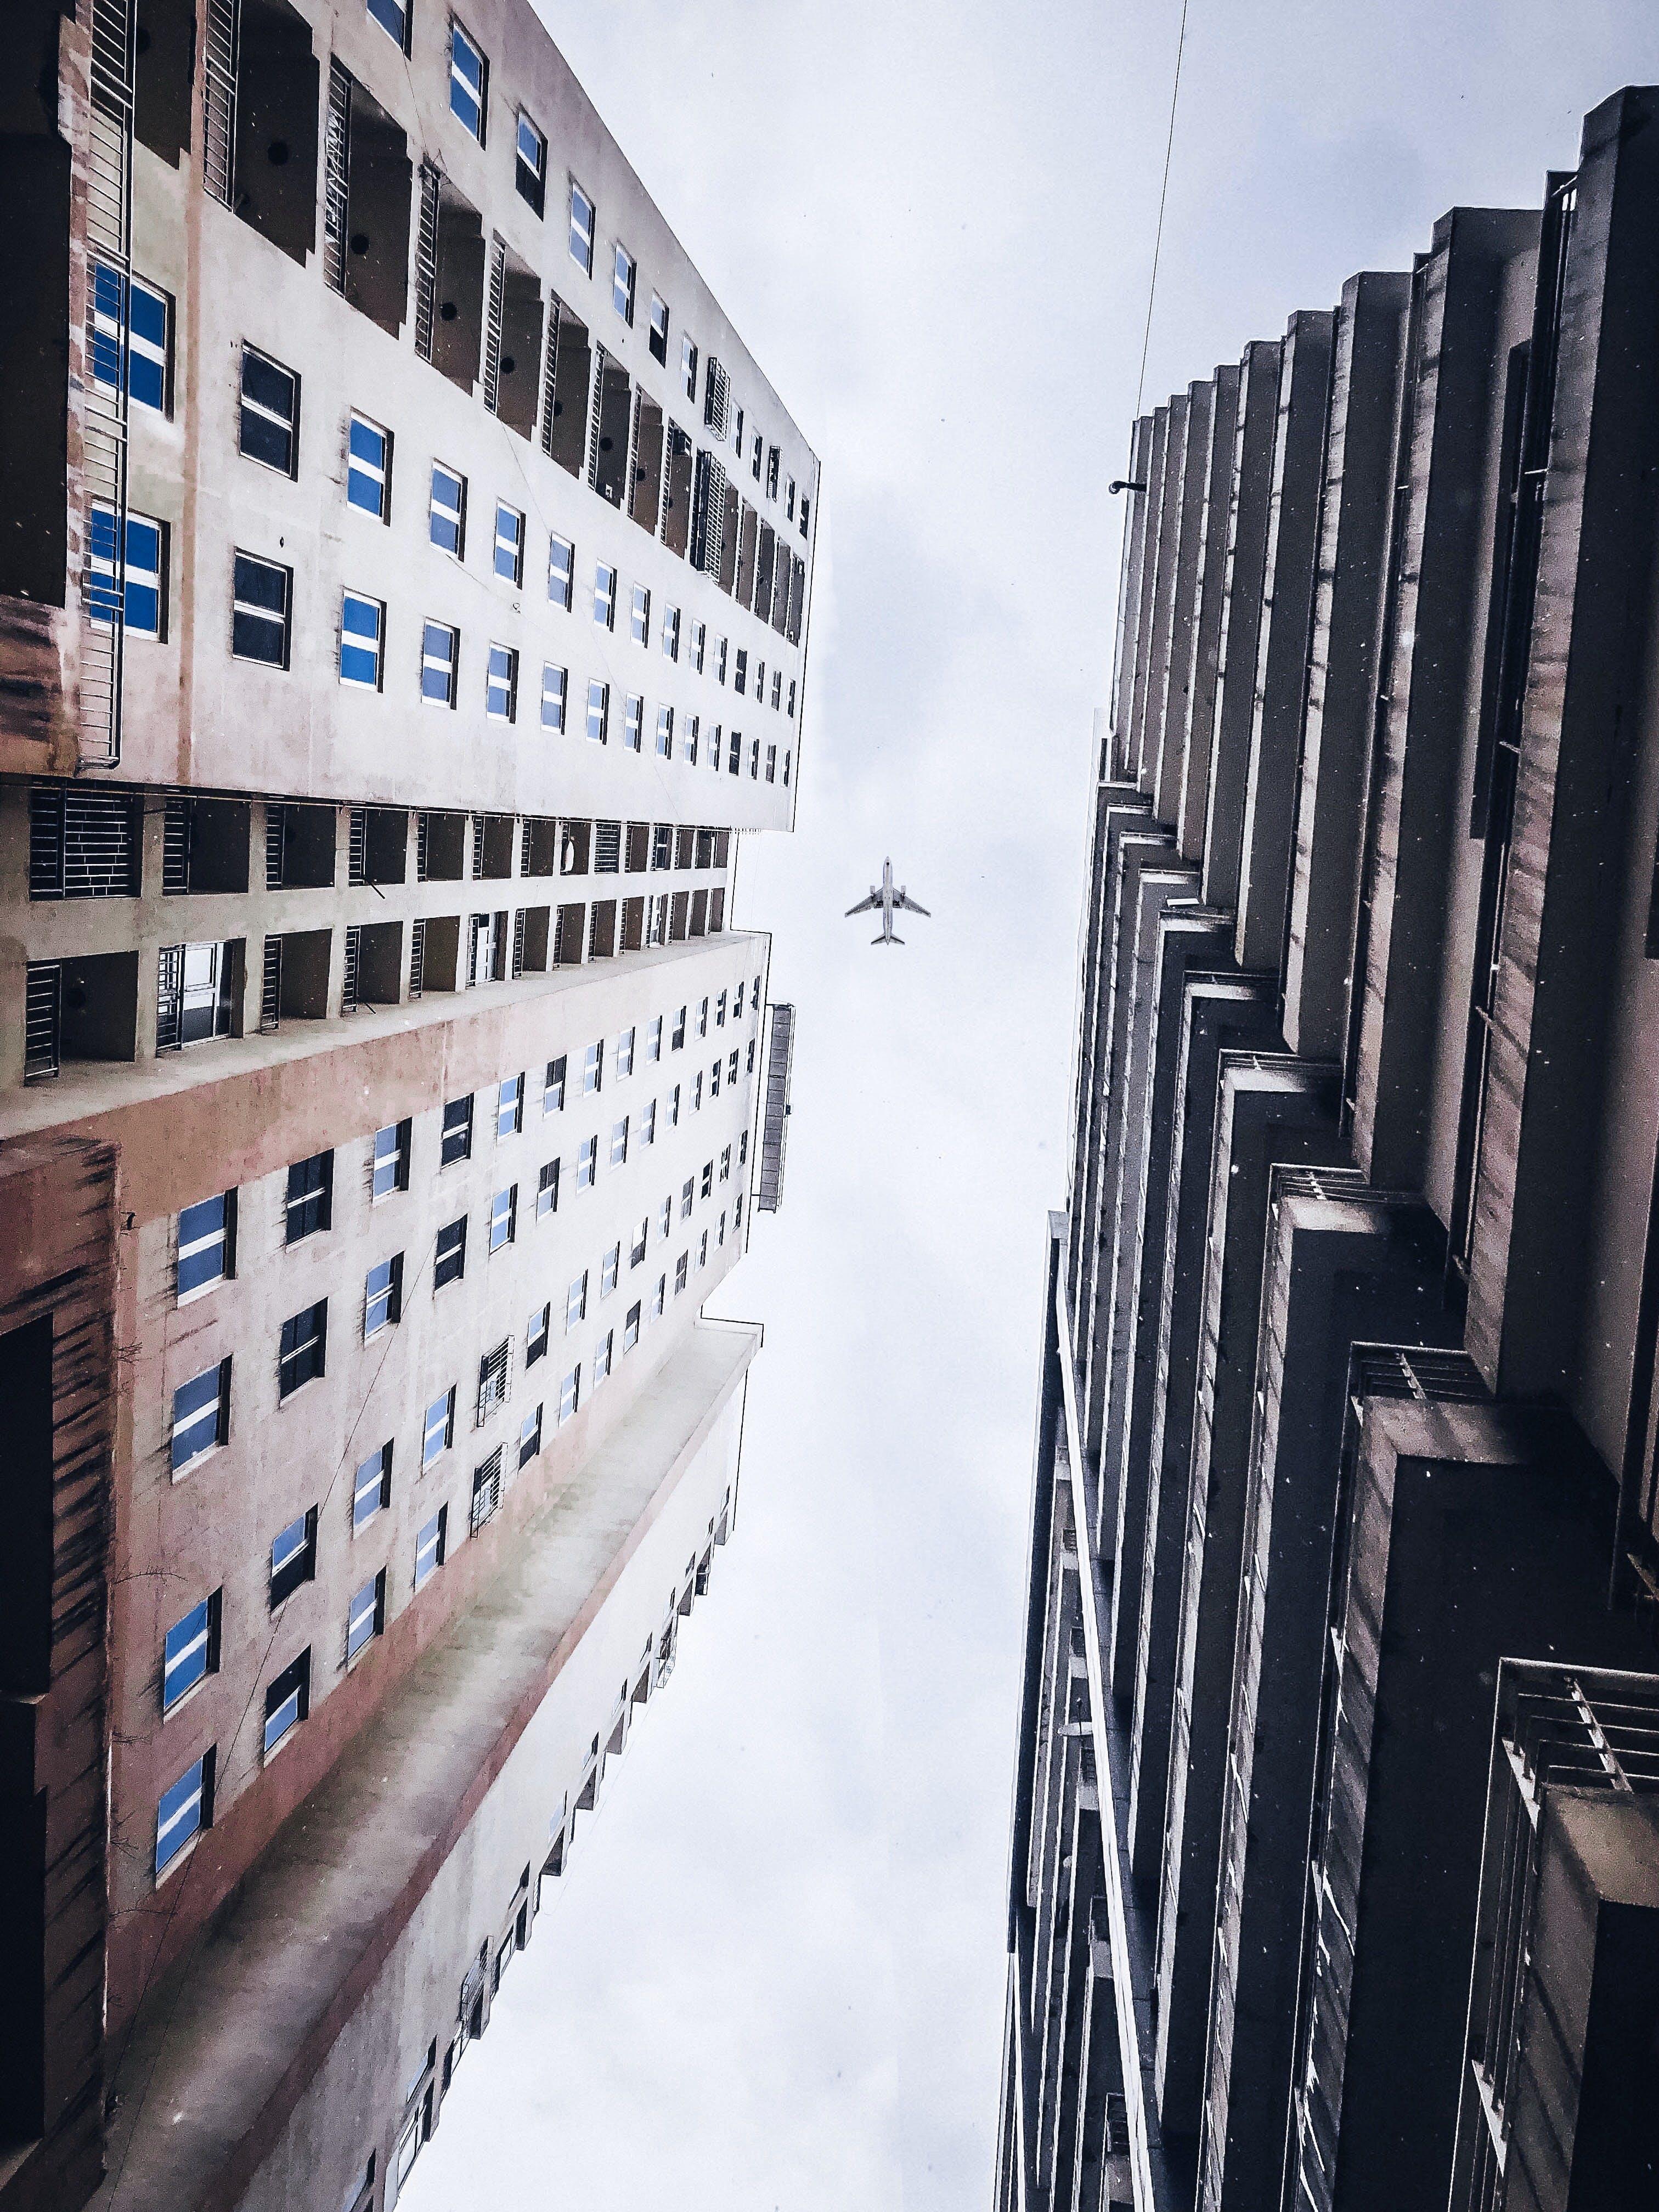 Gratis stockfoto met architectuur, binnenstad, flat, gebouwen